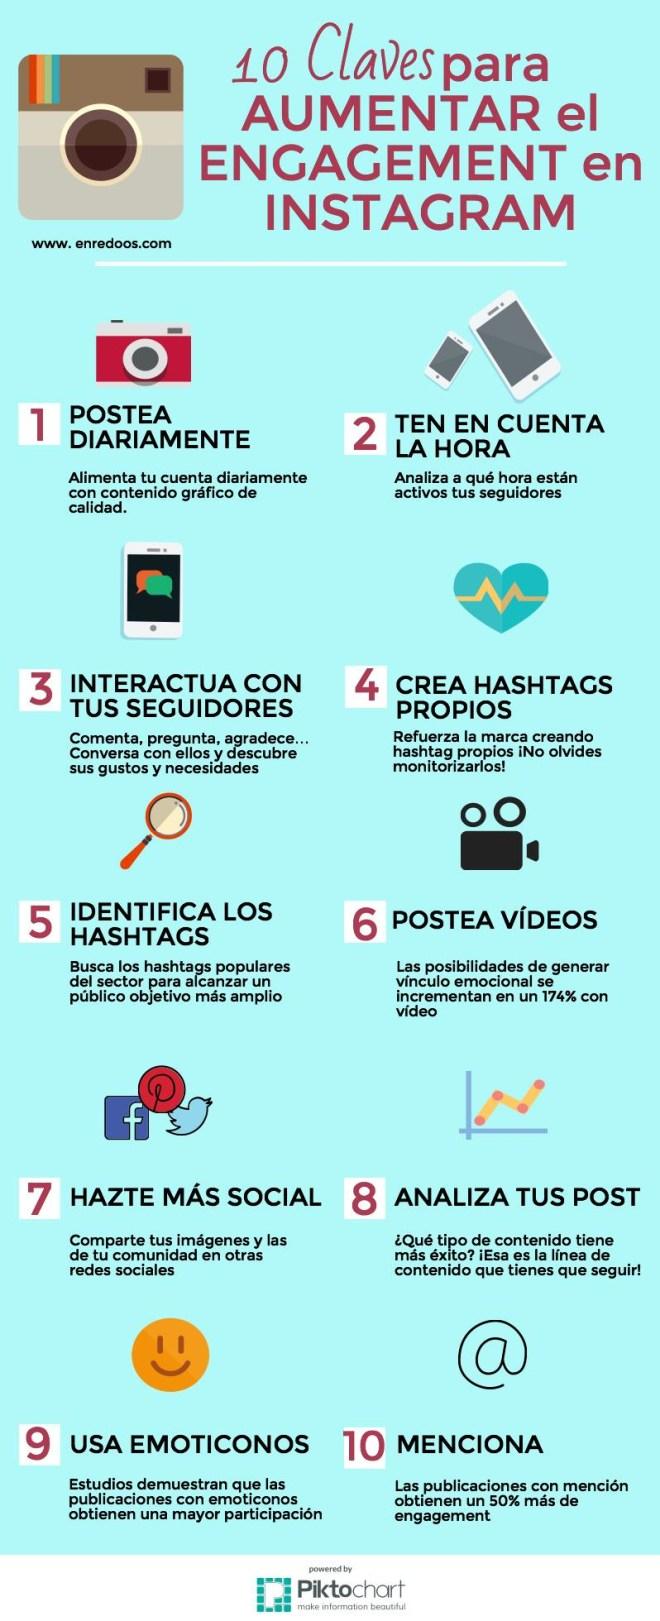 10 claves para aumentar el engagement en Instagram